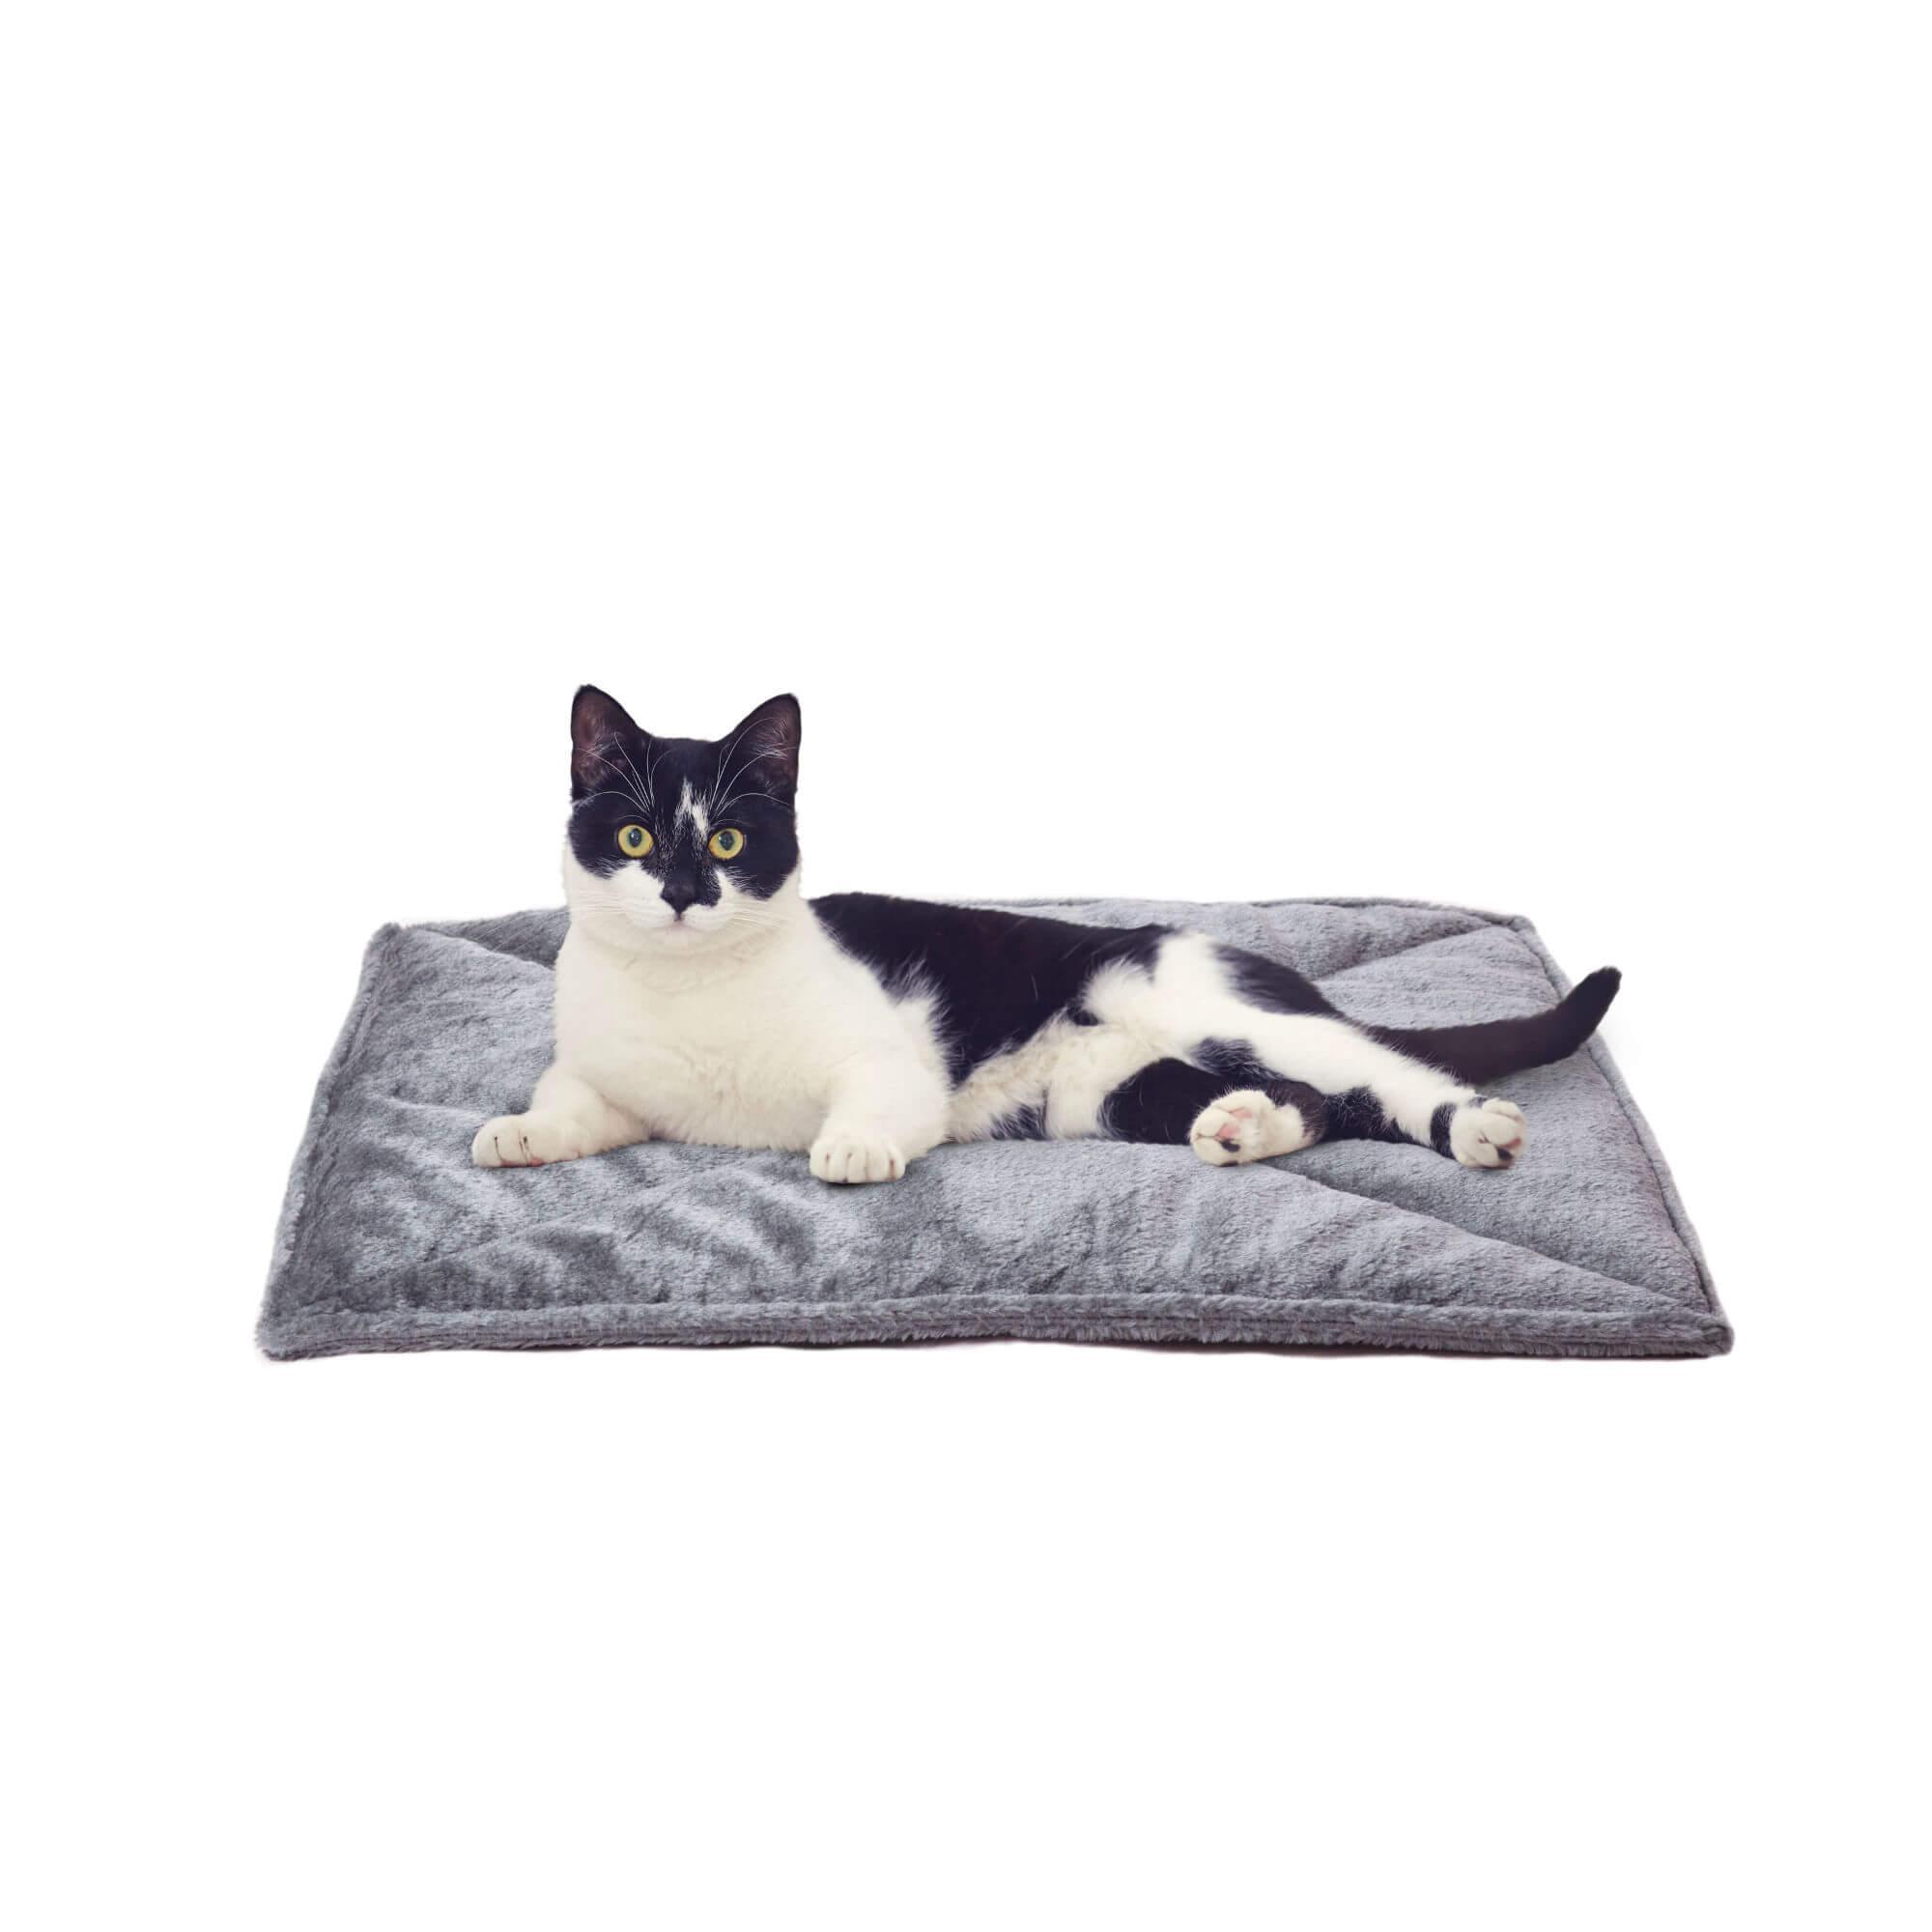 ThermaNAP Faux Fur Self-Warming Pet Mat - Gray